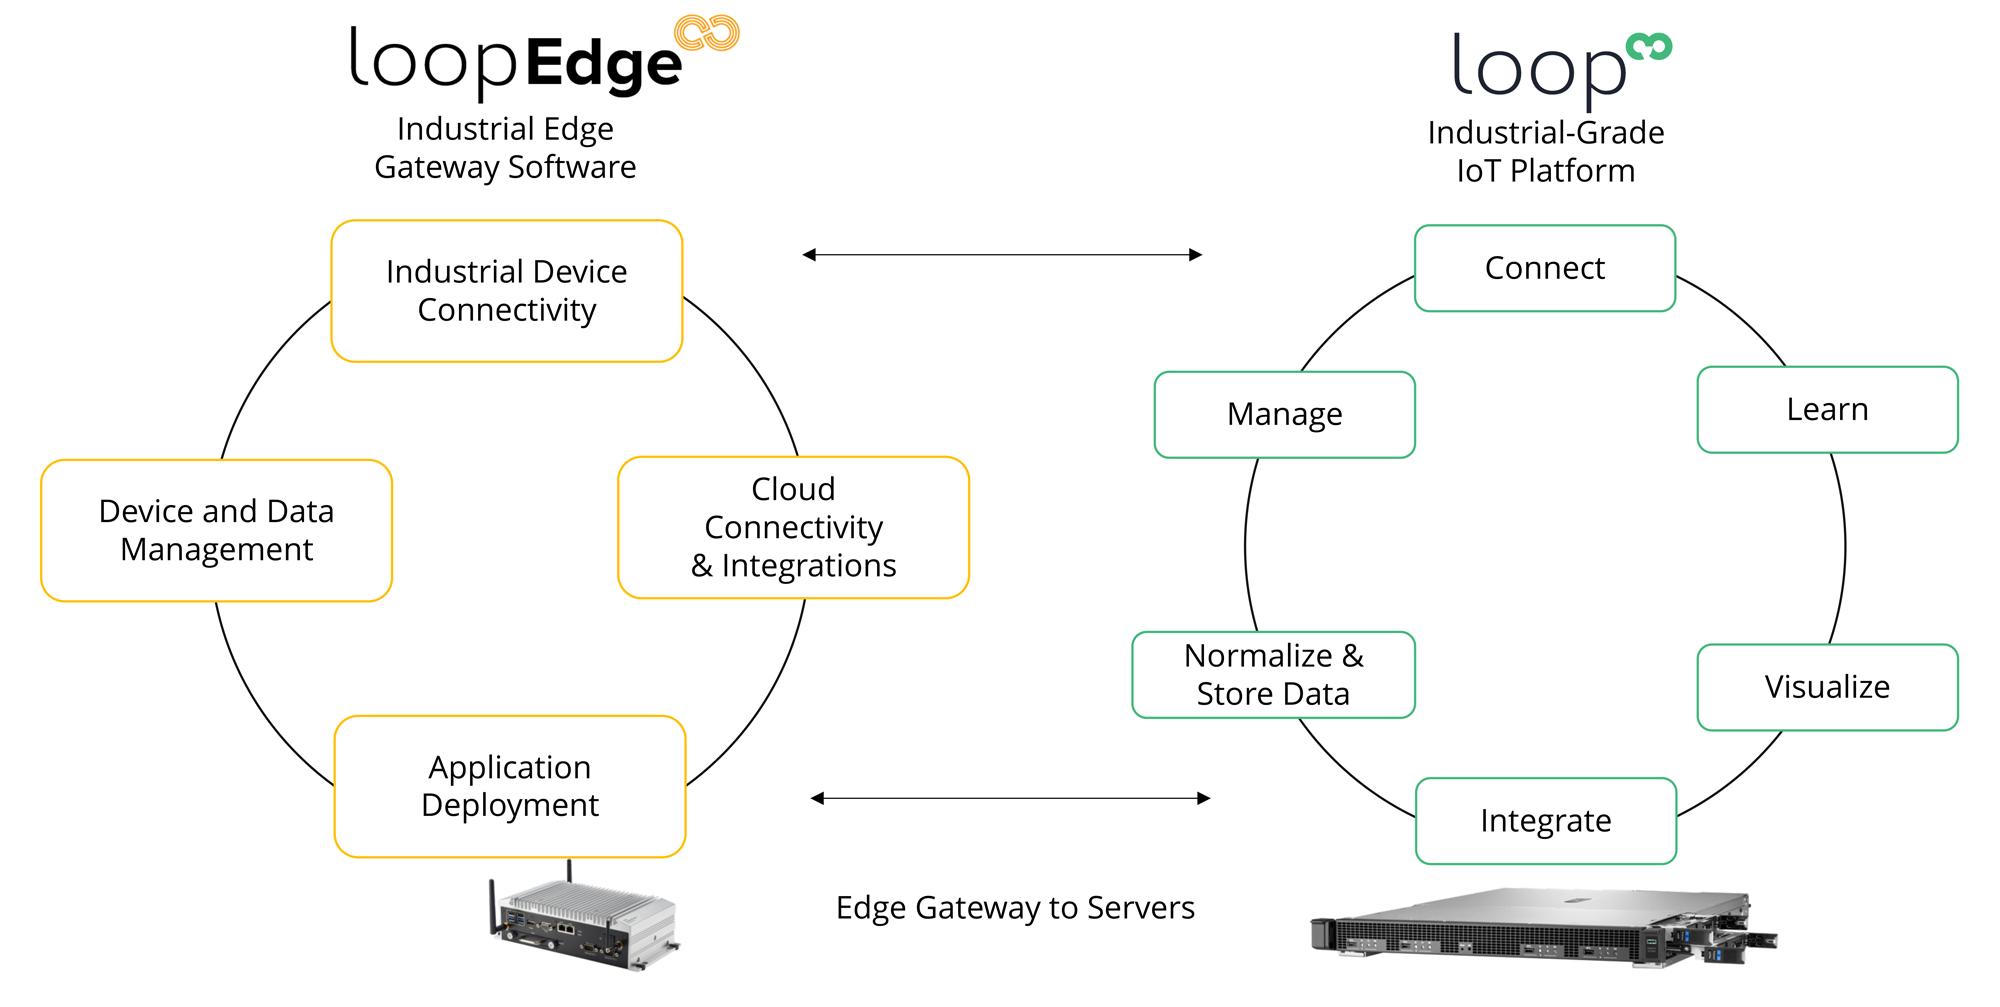 Litmus Automation 解决方案提供无缝的边缘计算和云管理